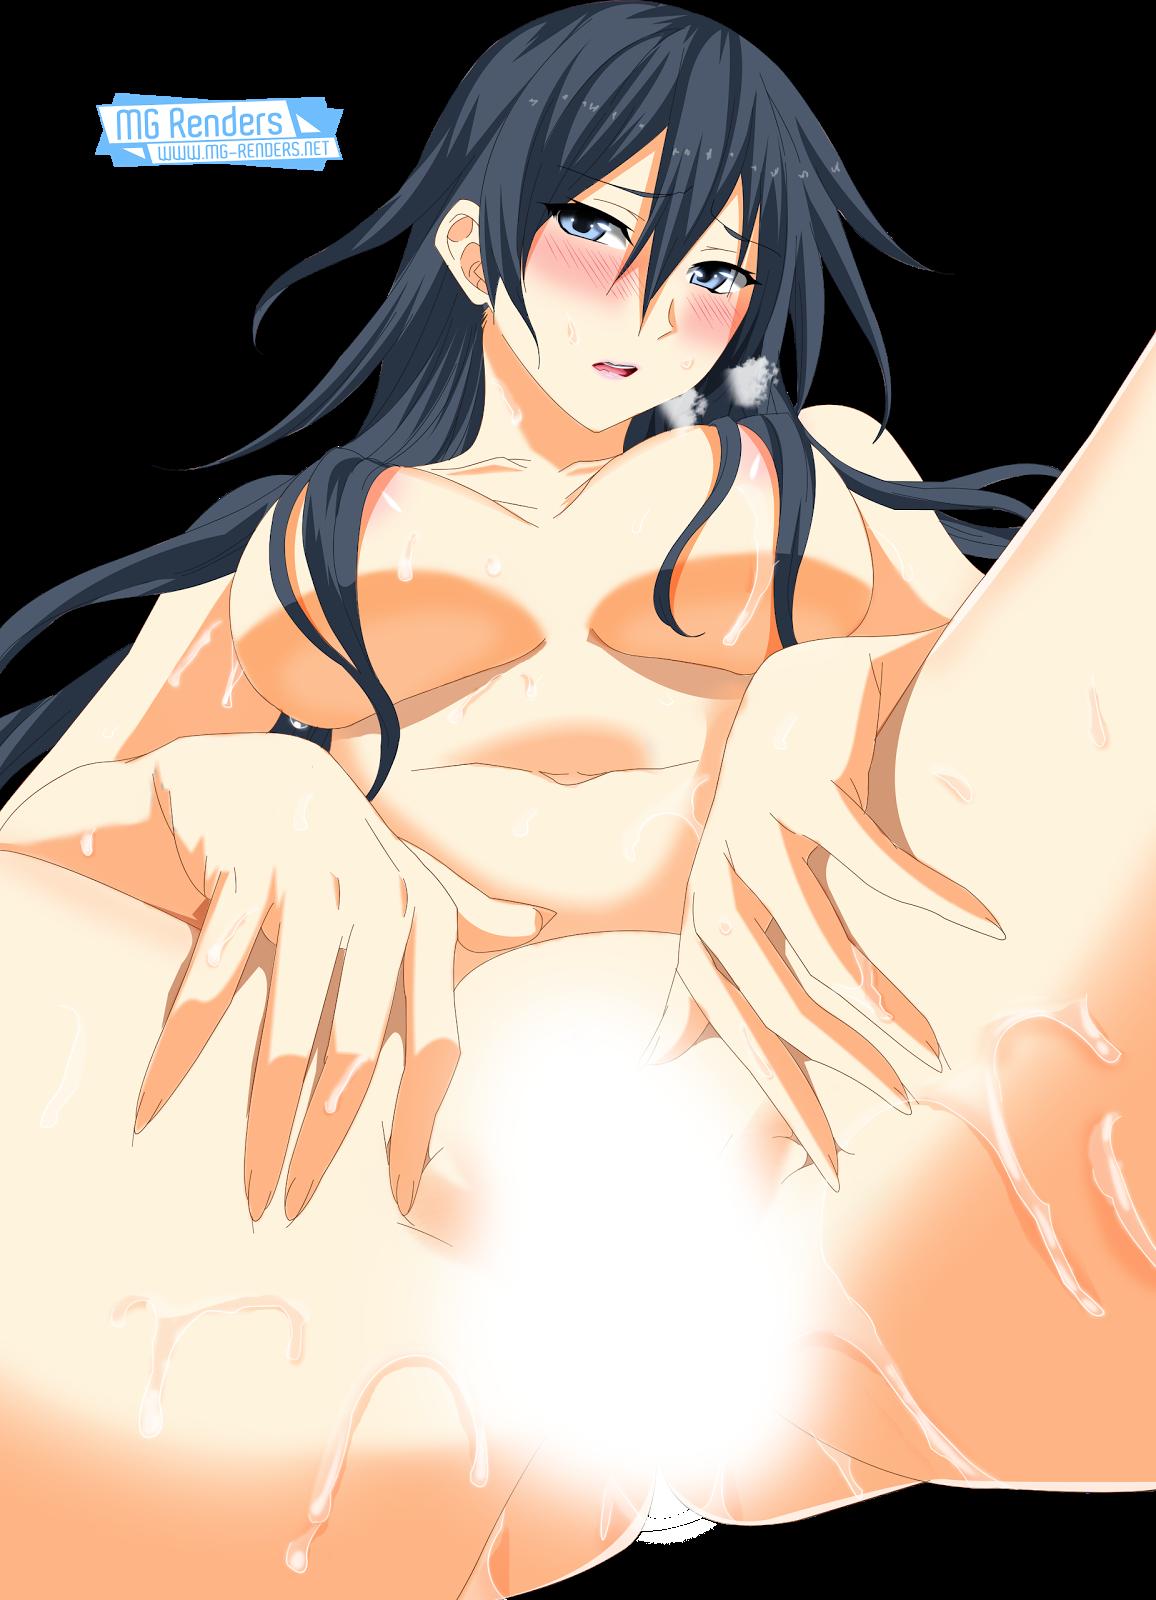 Tags: Anime, Render,  Hida Reiri,  Hisasi,  Masou Gakuen HxH,  Topless,  PNG, Image, Picture